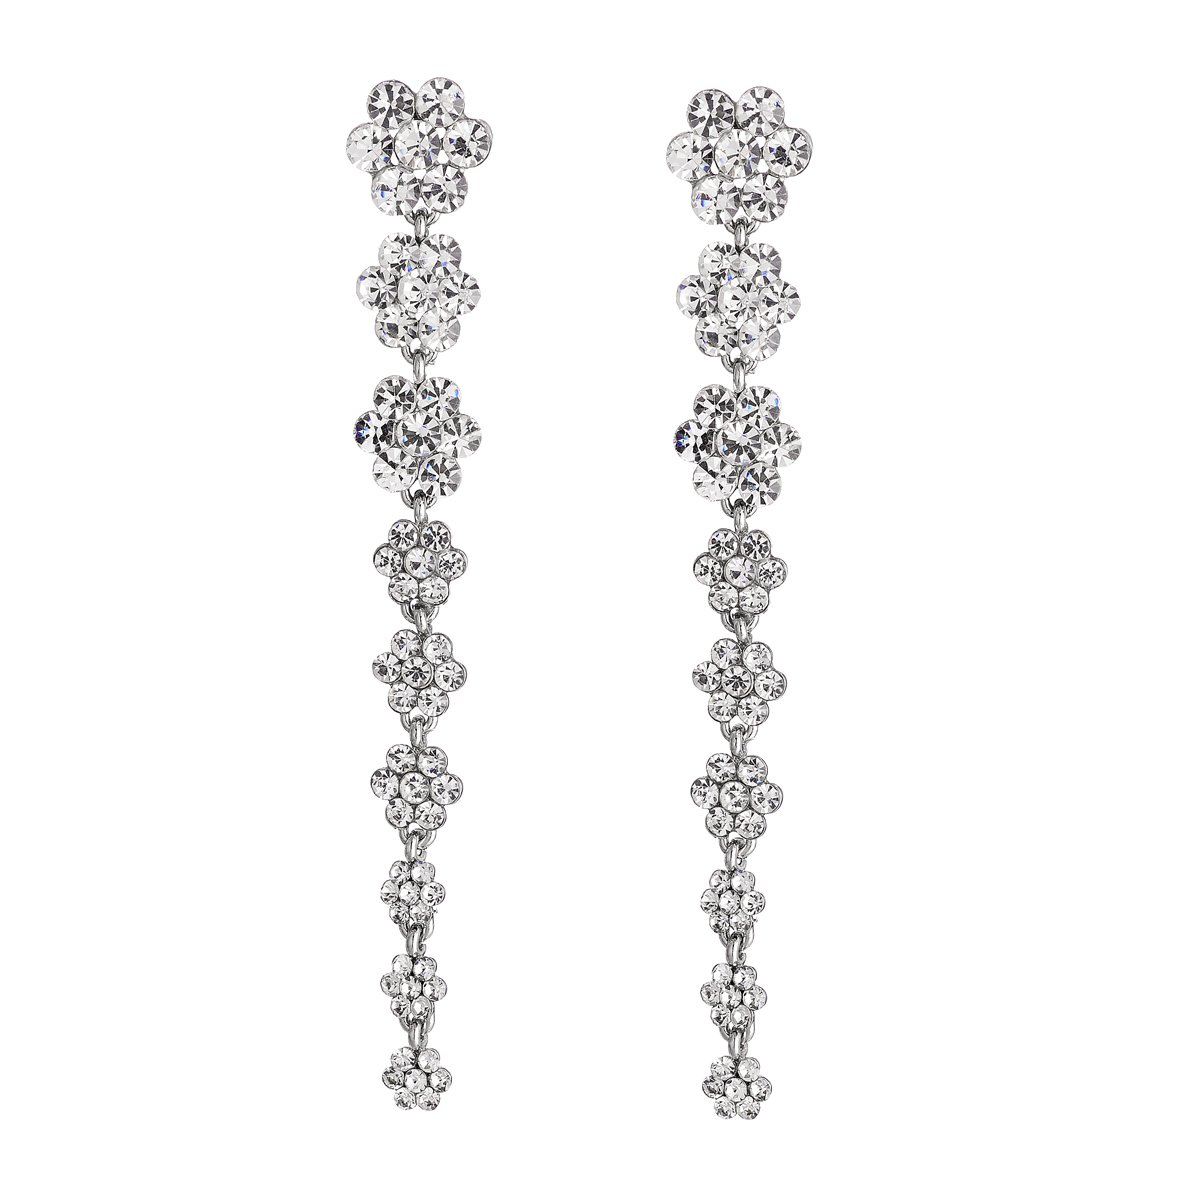 FF Super Long Earrings for Wedding Flower Rhinestone Earrings